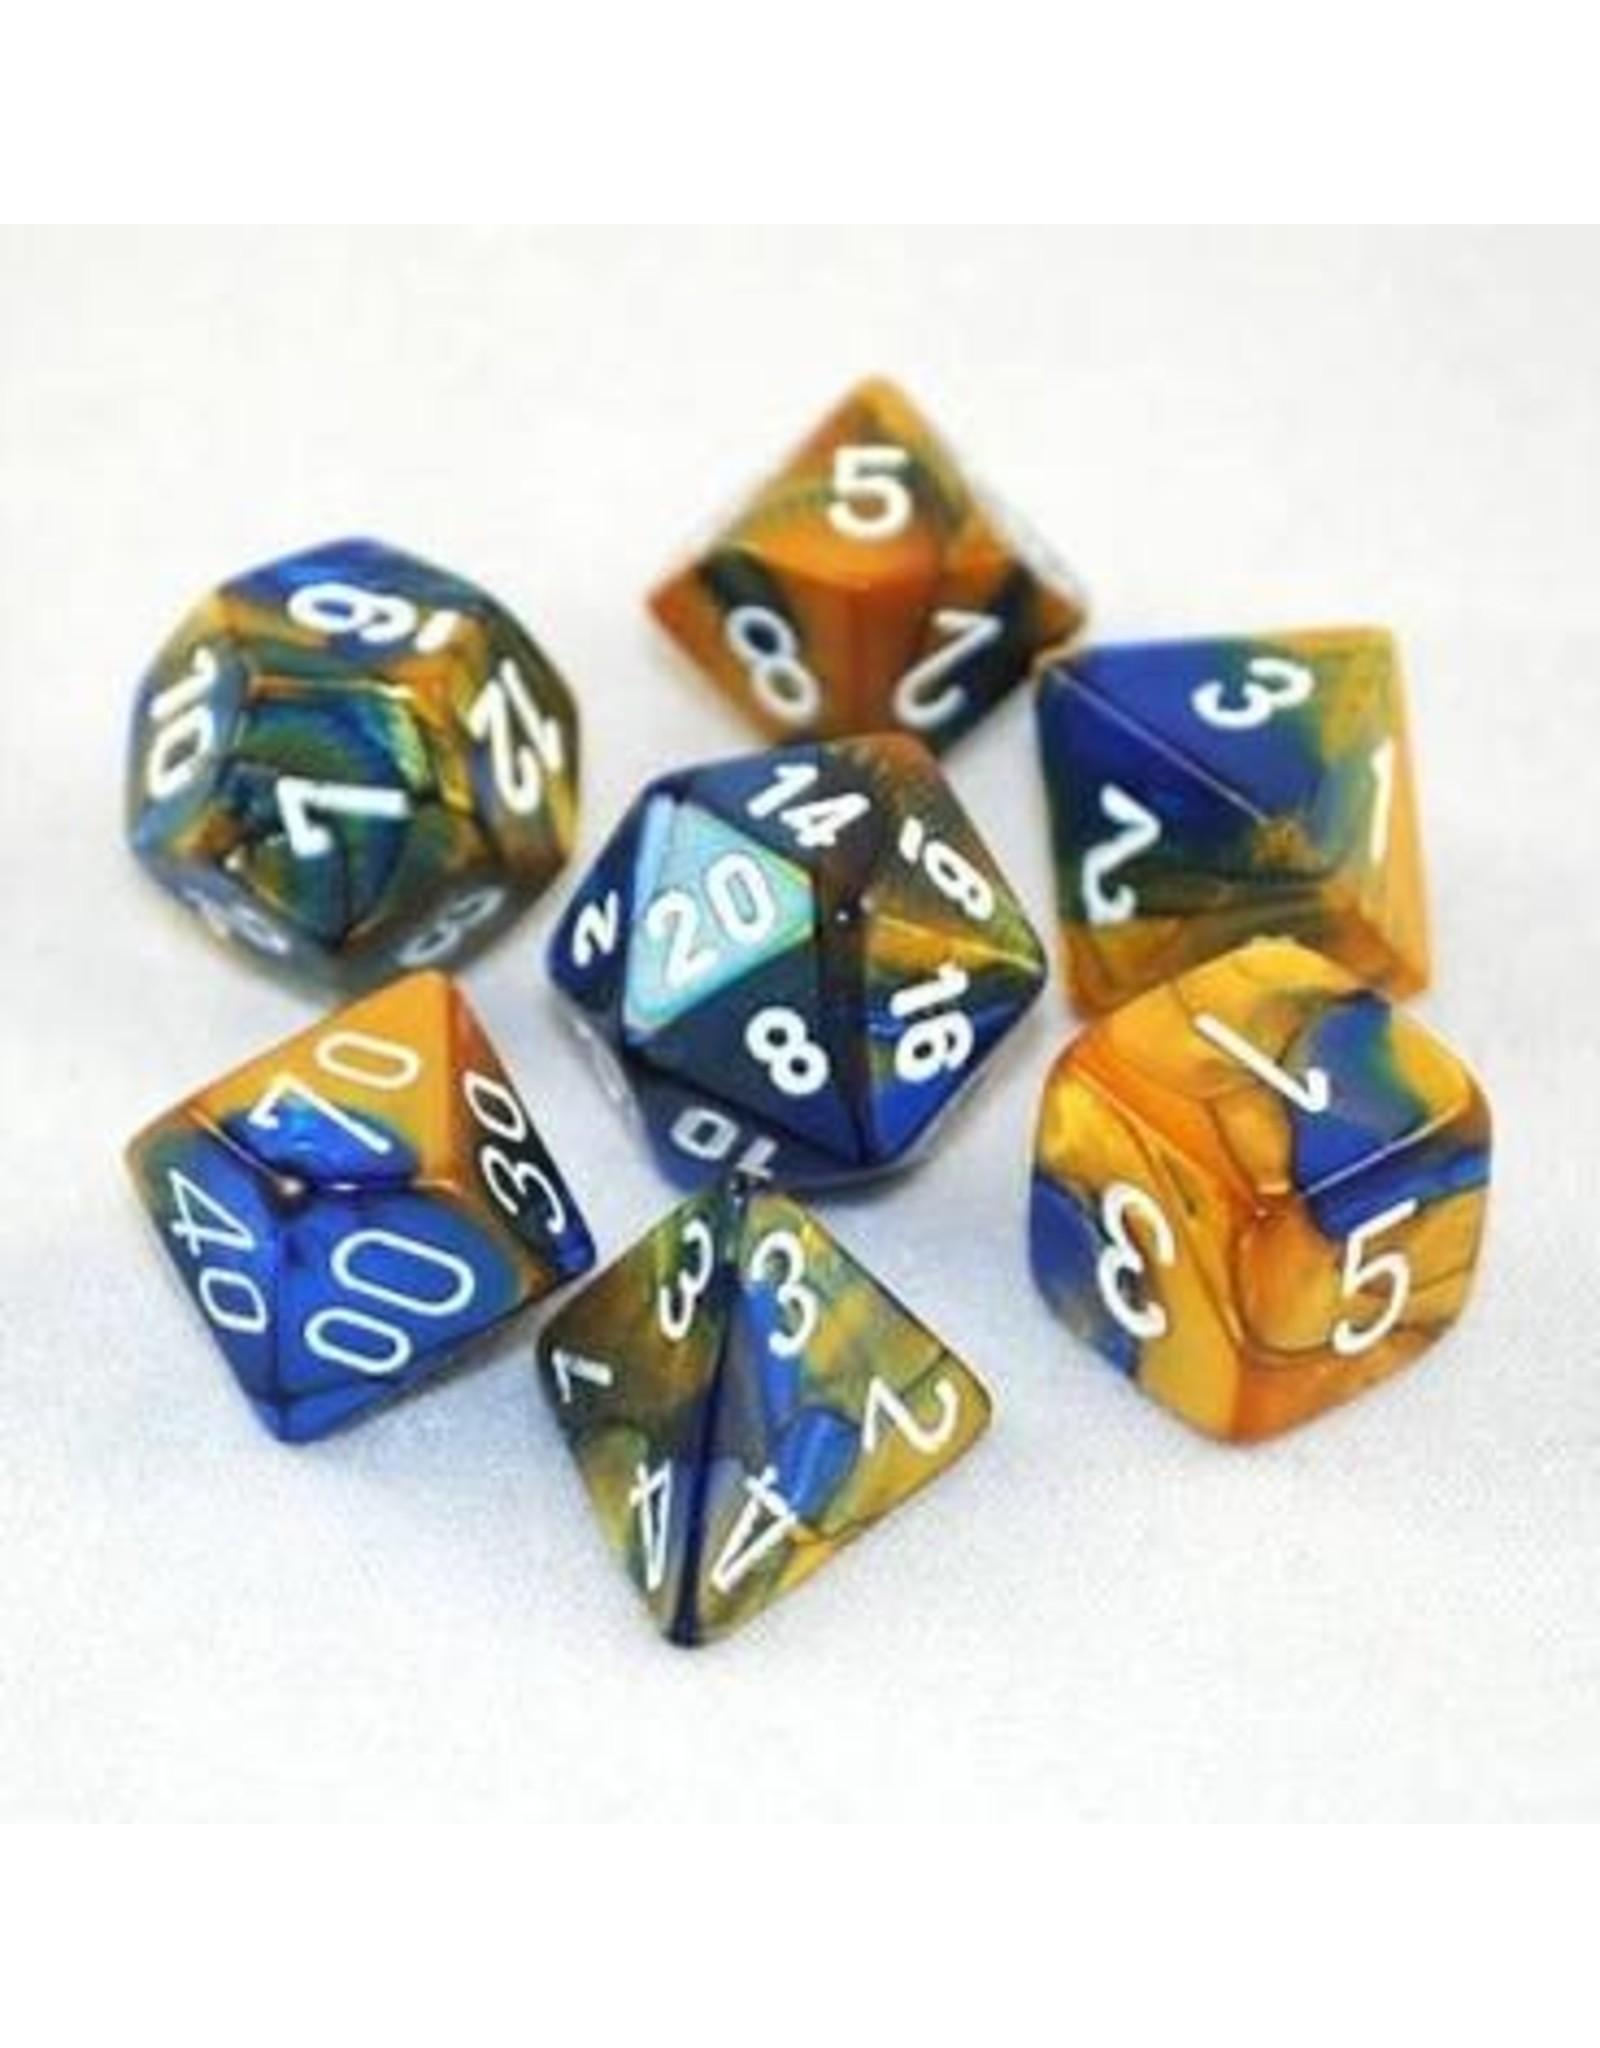 Chessex 7-Set Polyhedral Gemini Blue Gold/white